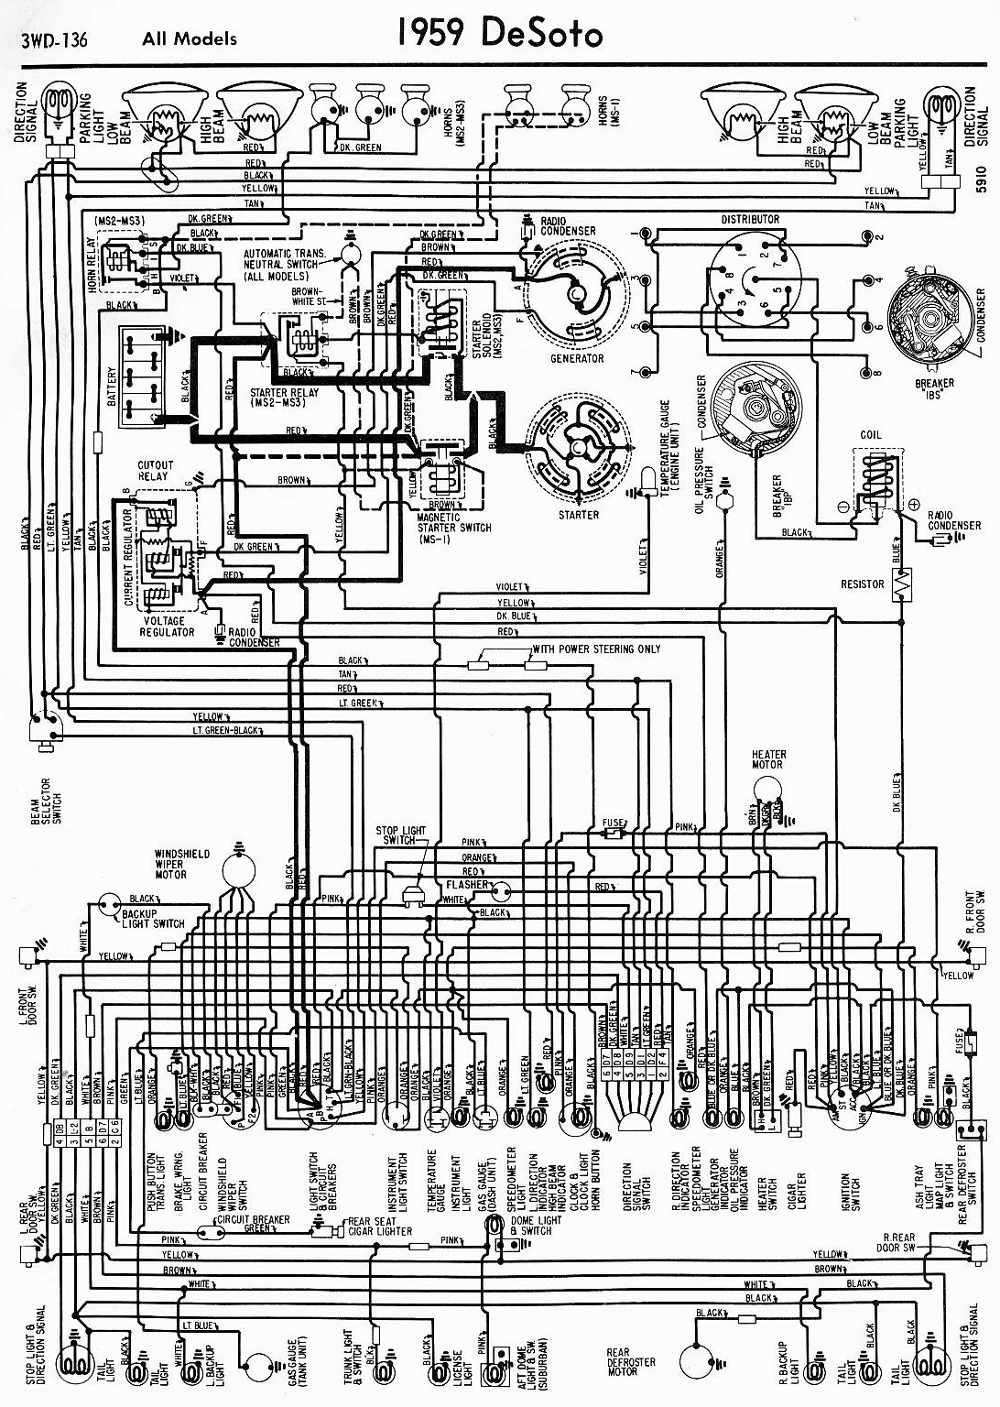 wiring diagrams of 1959 desoto all models?t\=1508403749 1949 desoto wiring diagrams wiring diagrams  at virtualis.co